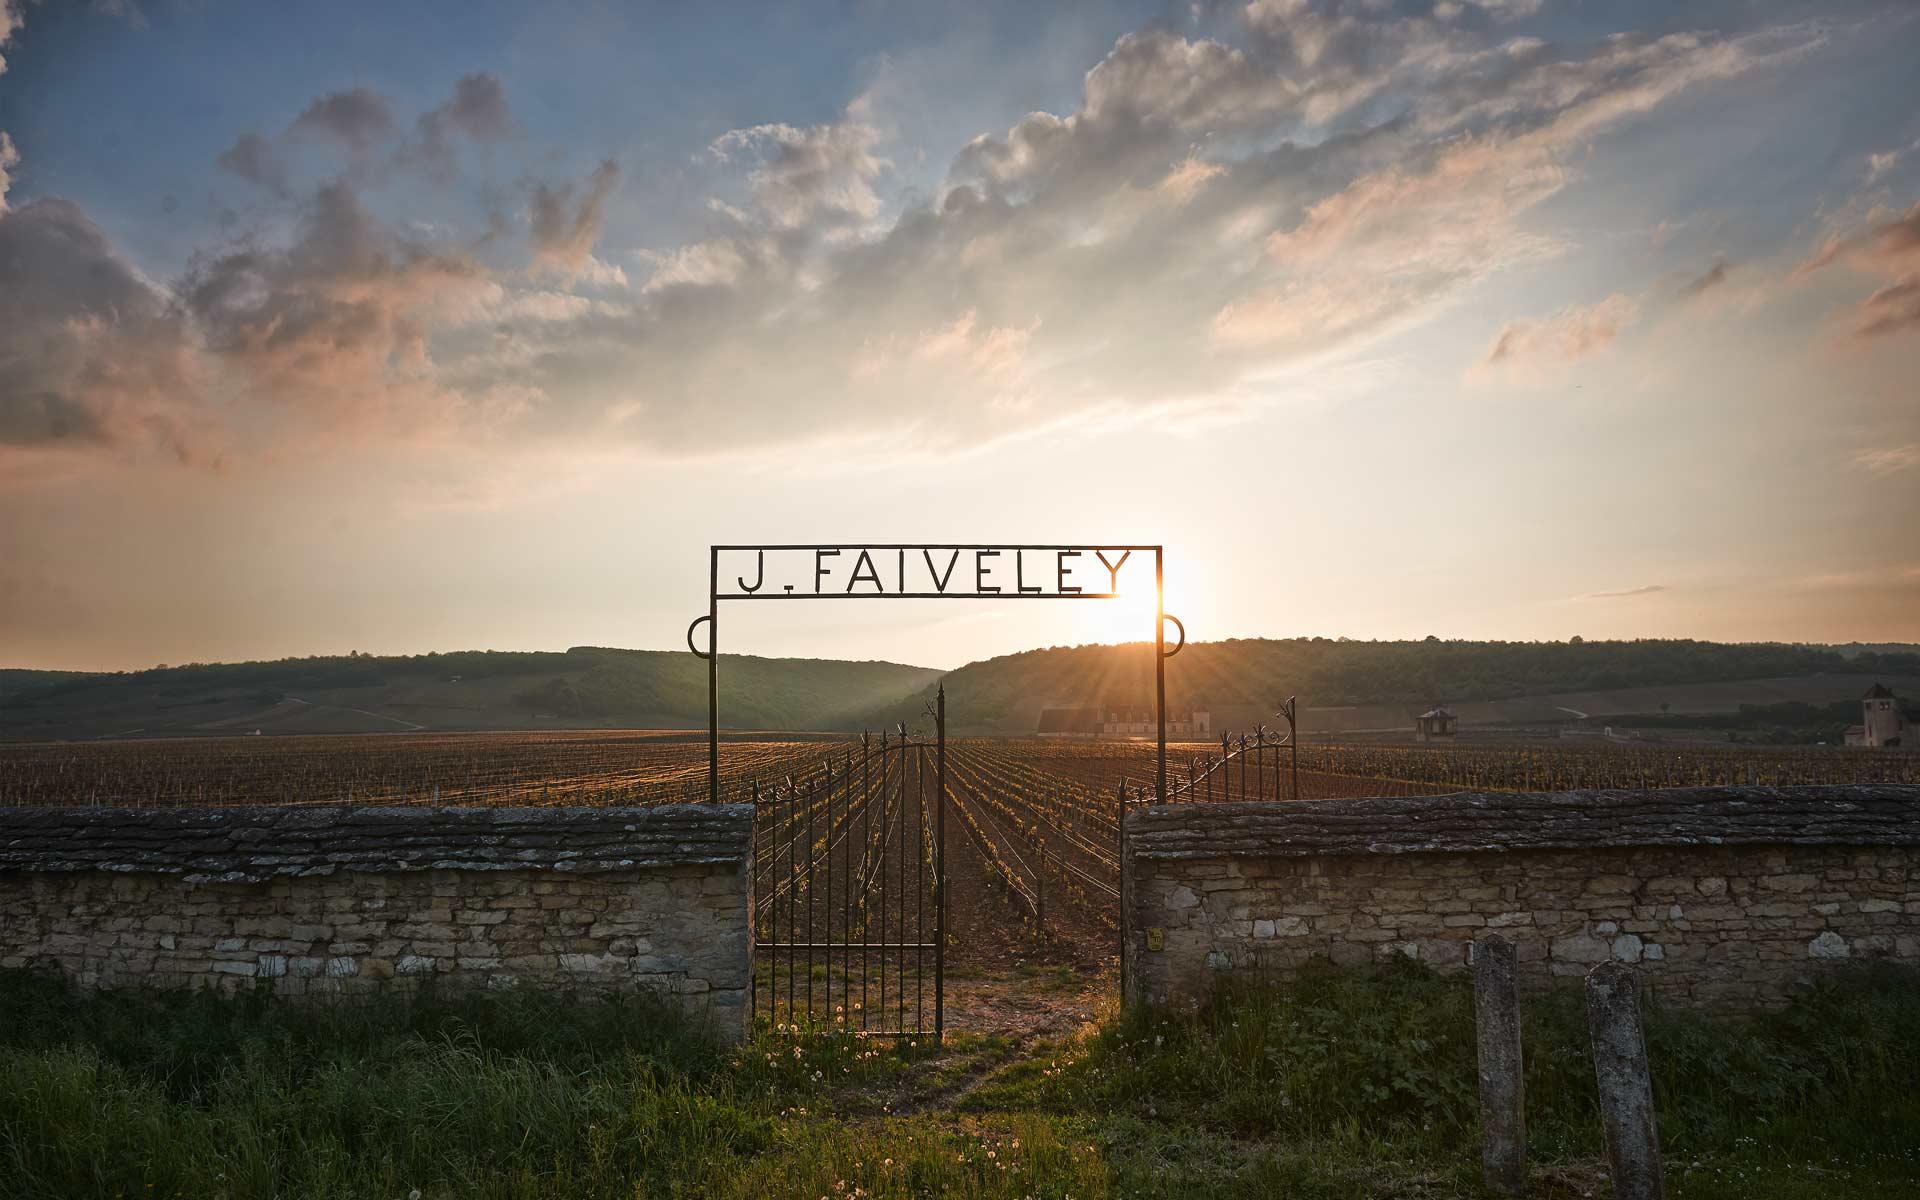 L.Faiveley